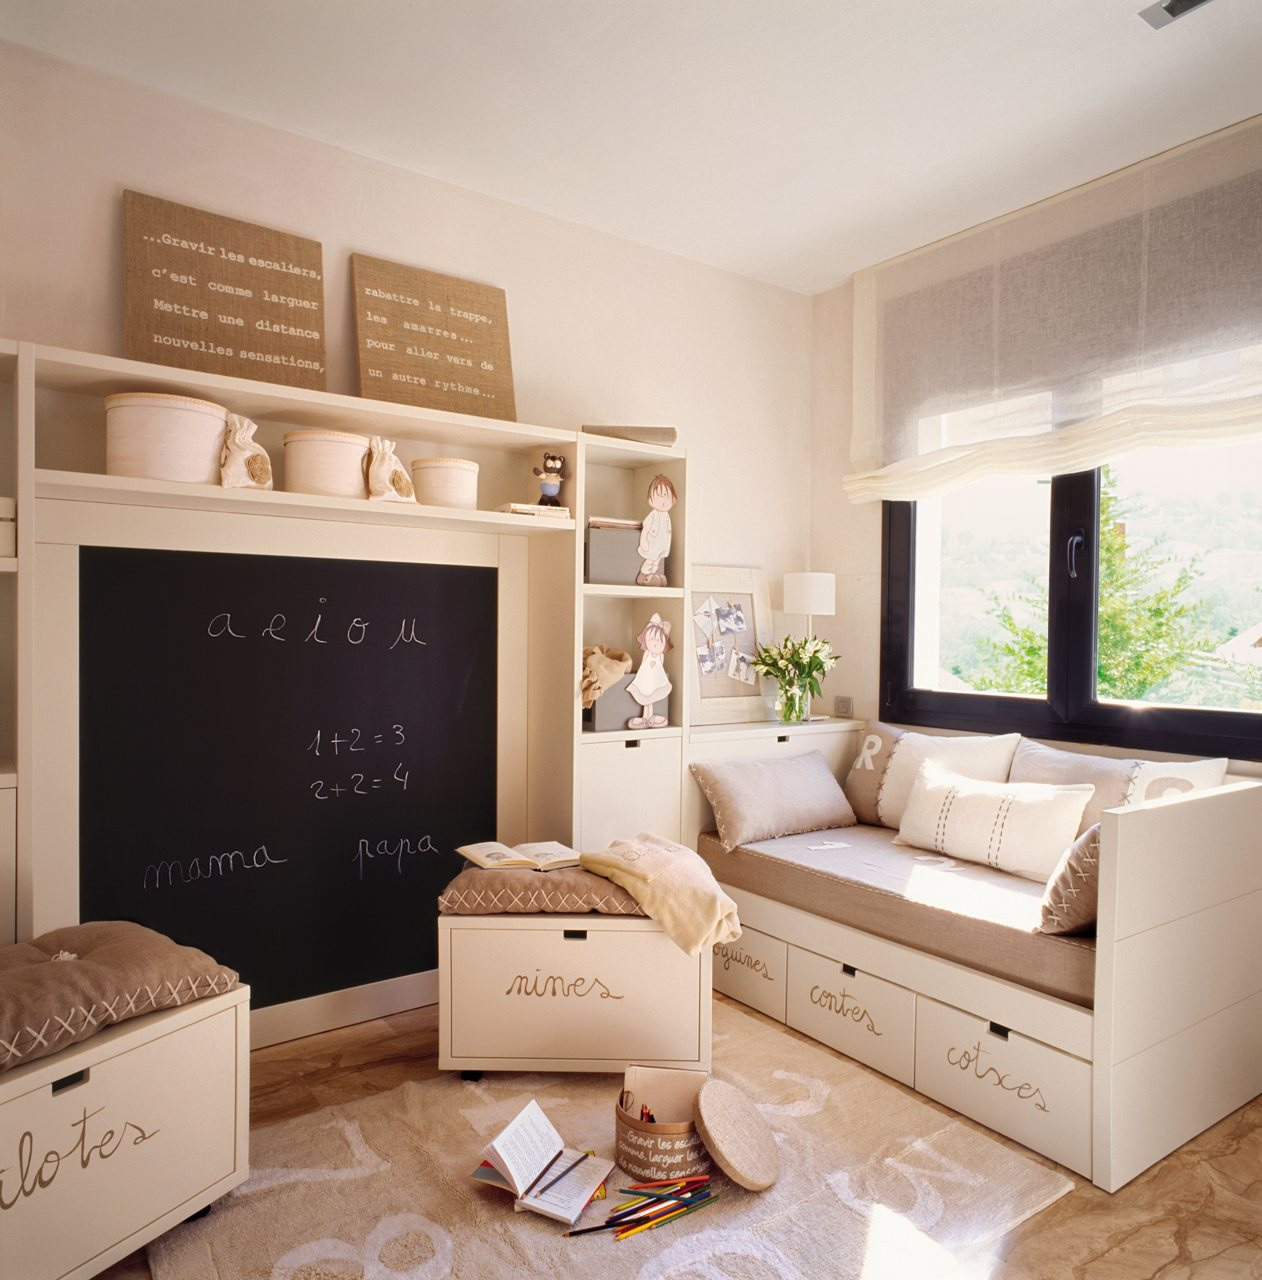 Dormitorios infantiles peque os s cales partido for Habitaciones infantiles pequenas para dos